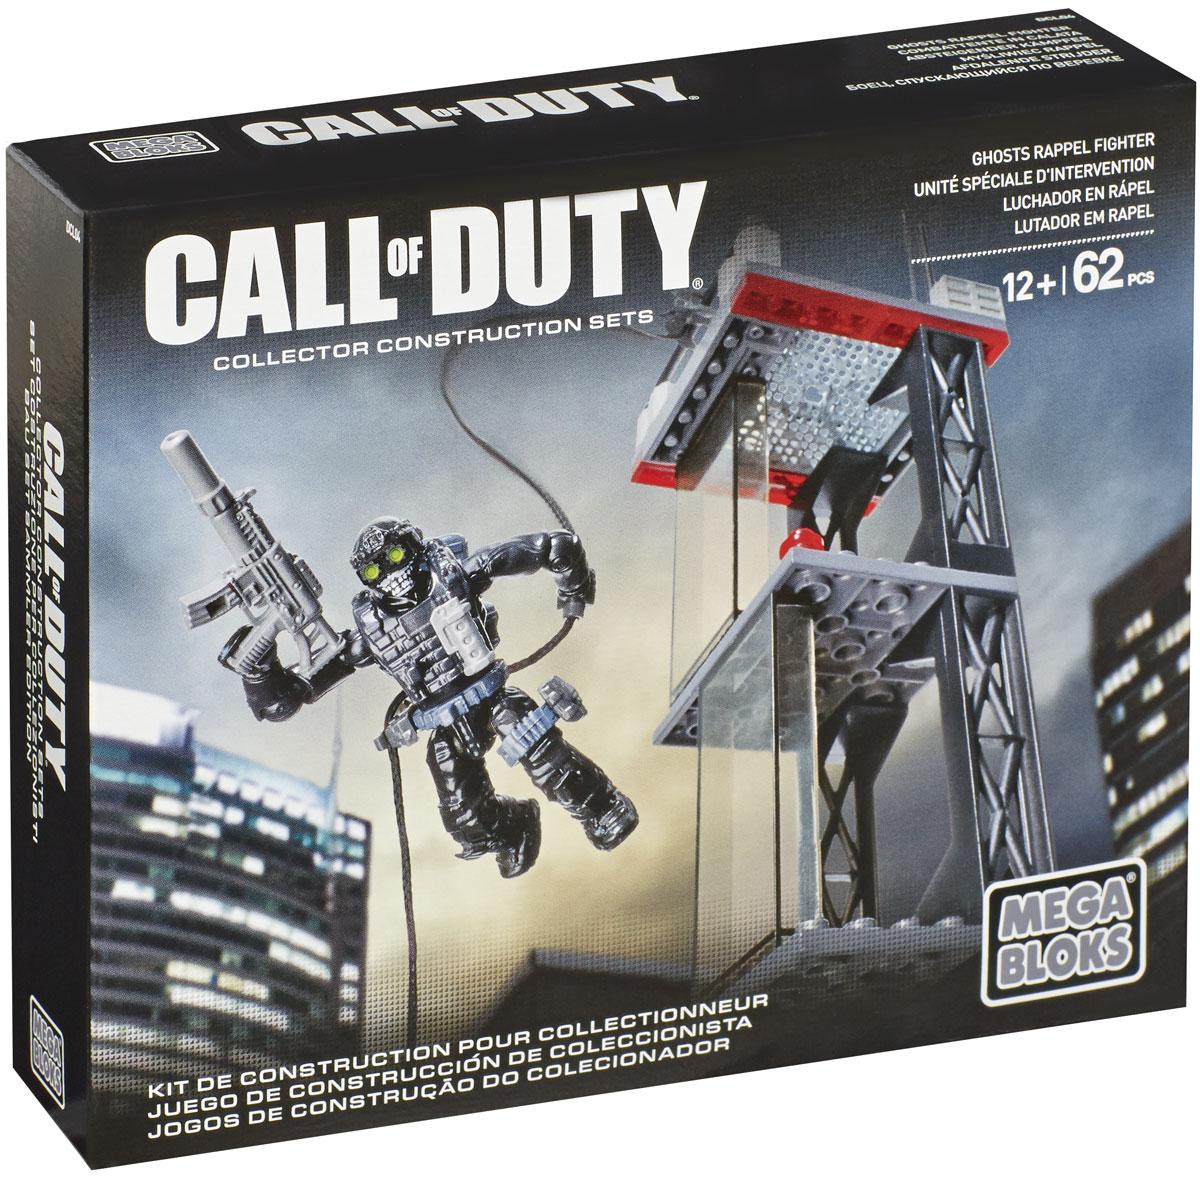 Mega Bloks Call Of Duty Конструктор Ghost Rappel Fighter mega bloks call of duty конструктор motorbike breakout